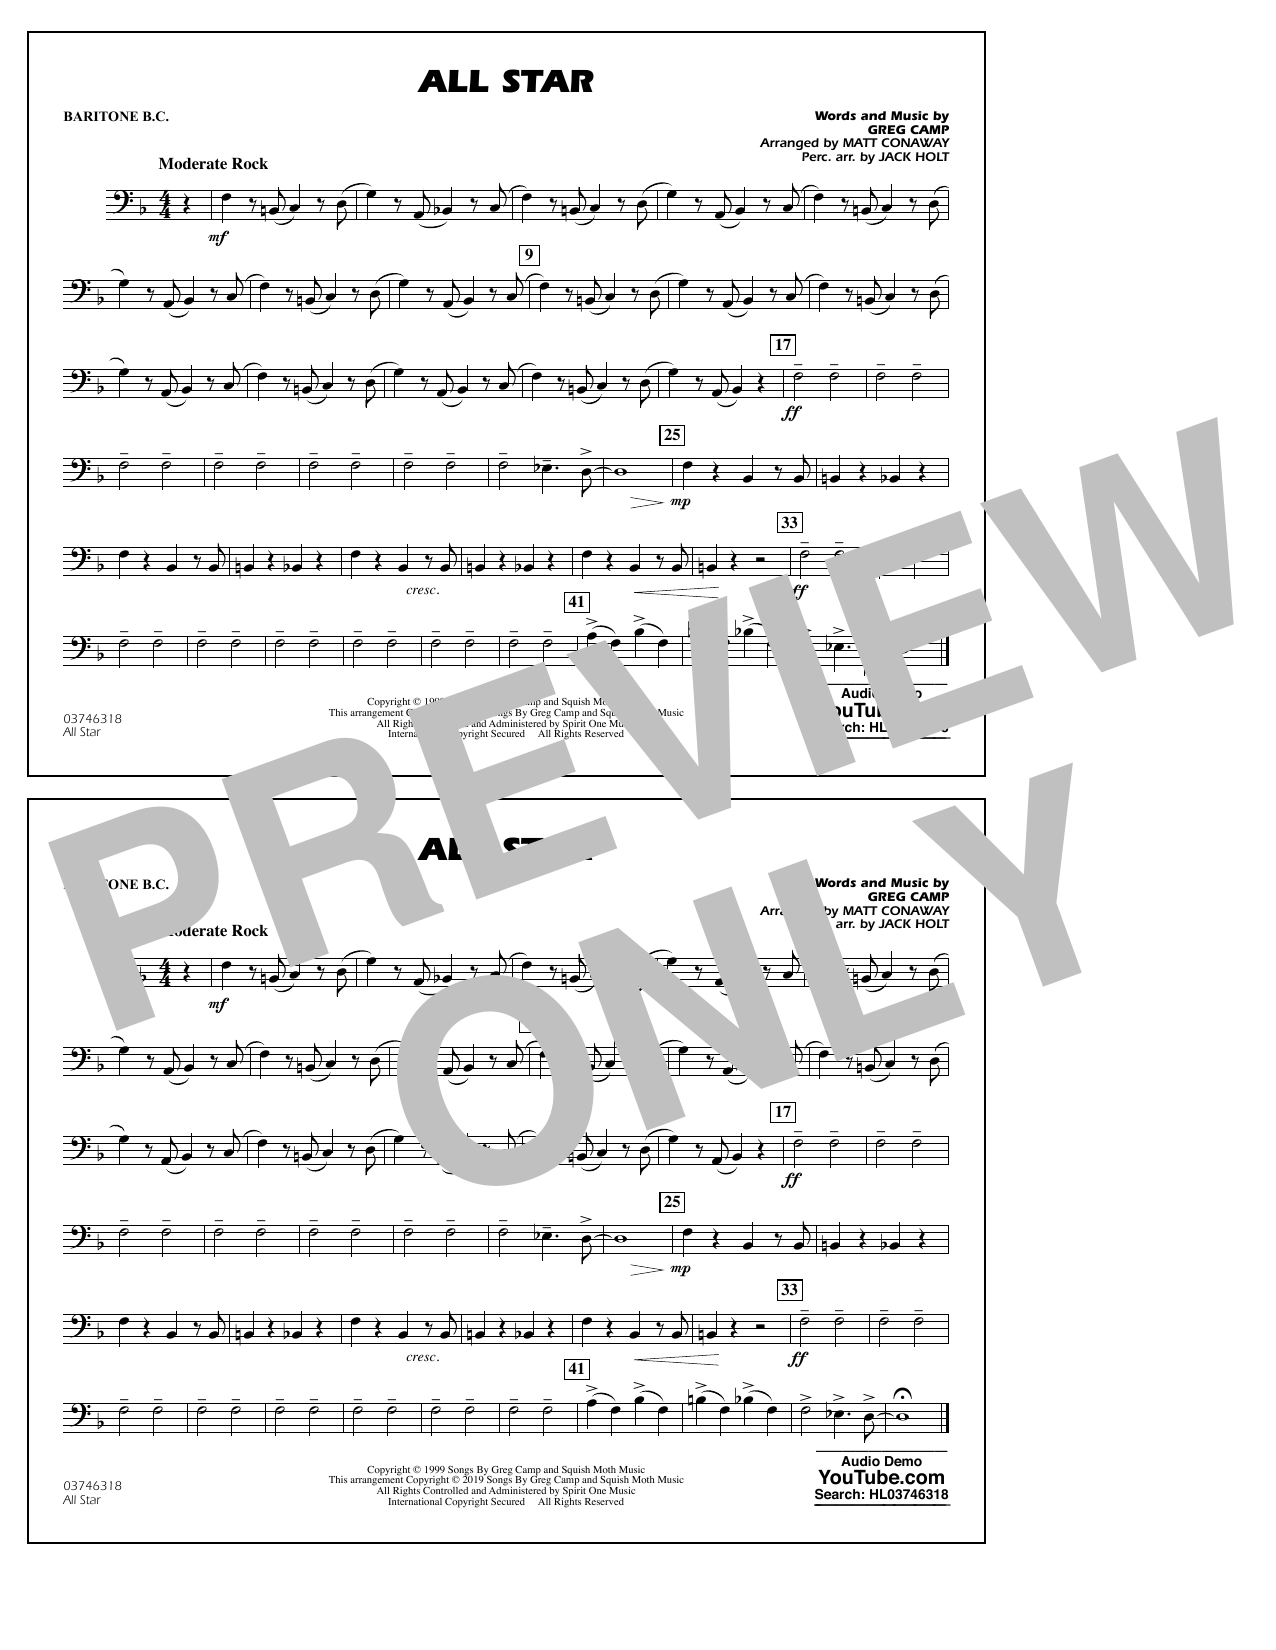 All Star (arr. Matt Conaway) - Baritone B.C. (Marching Band)